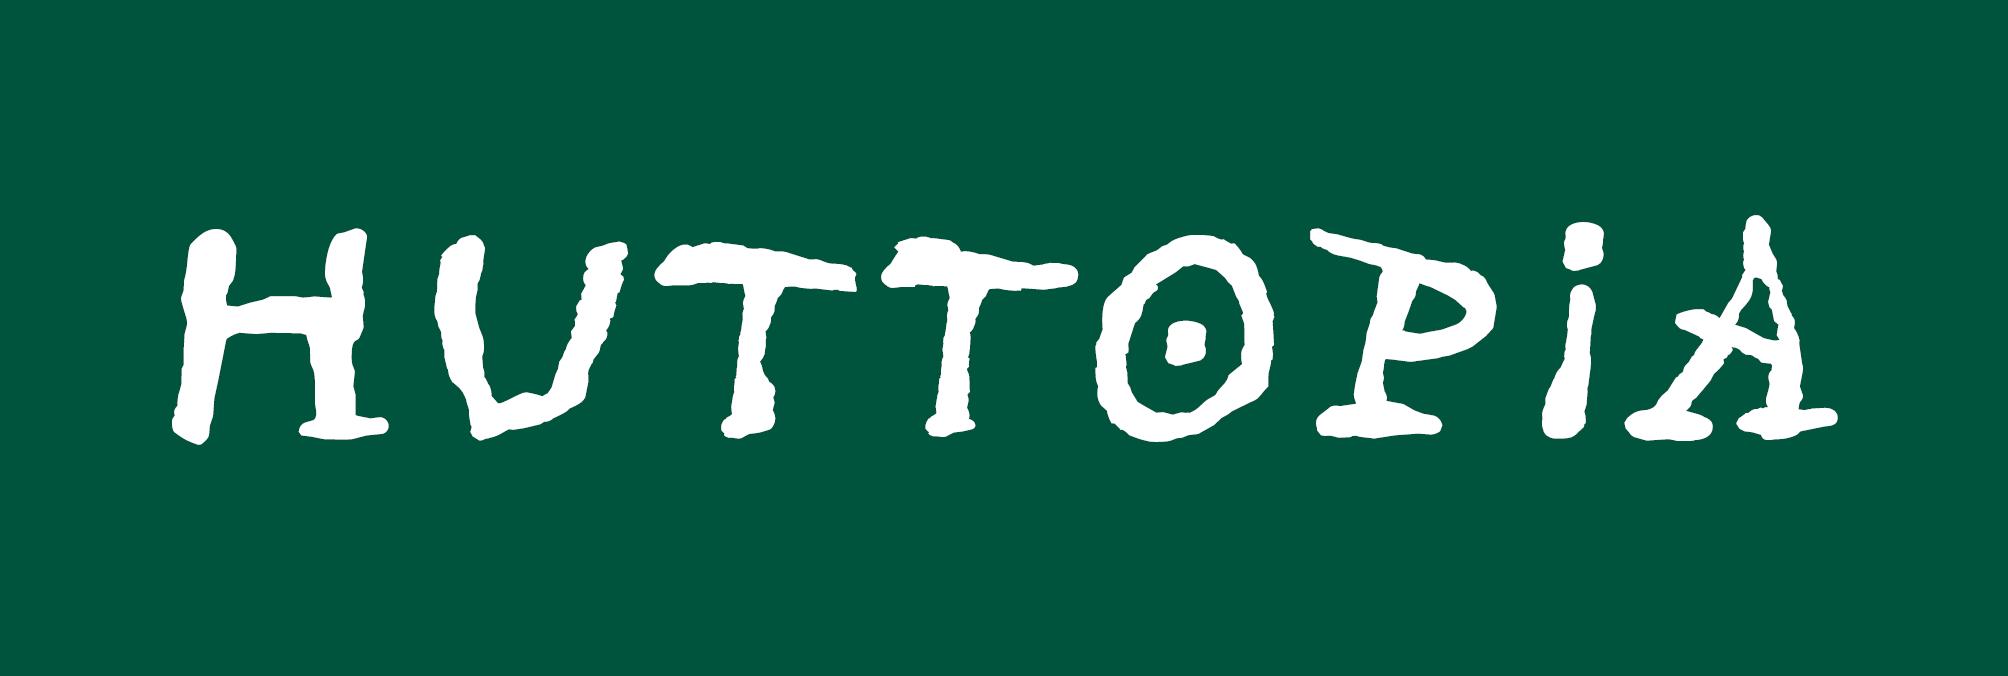 Huttopia Wattwiller